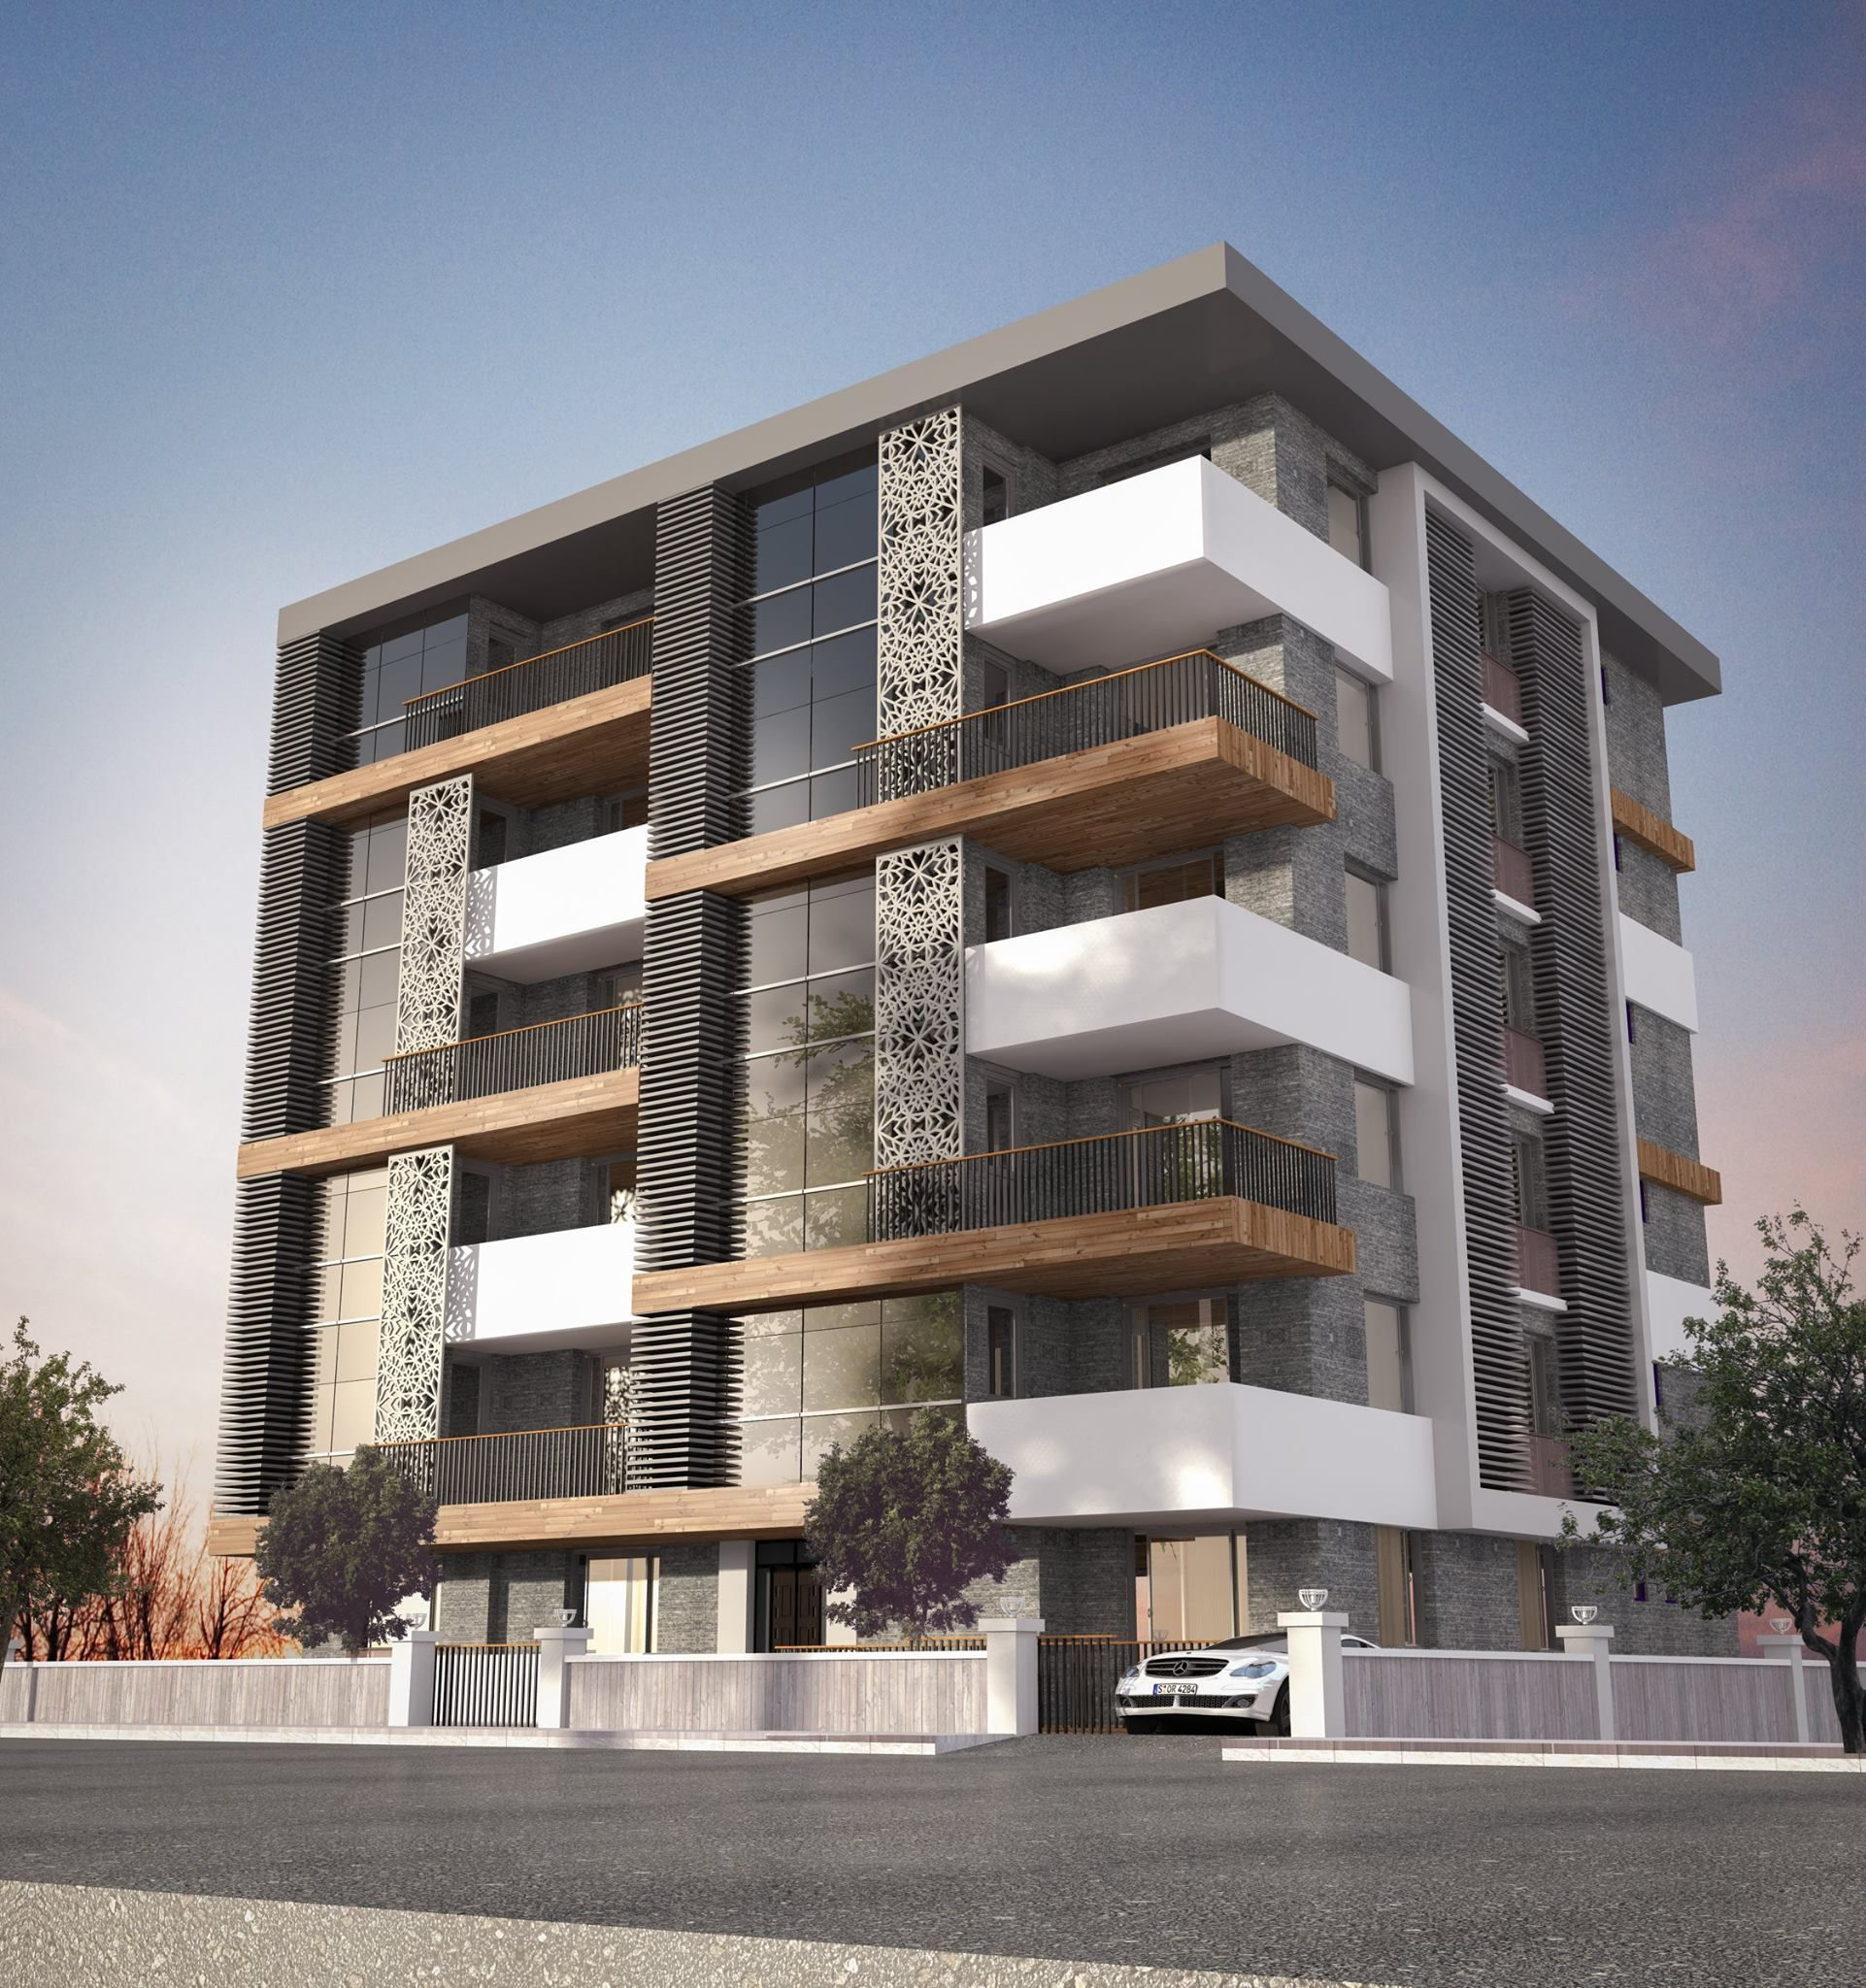 Modern architecture building design house buildings facade also  cephe useful pinterest rh